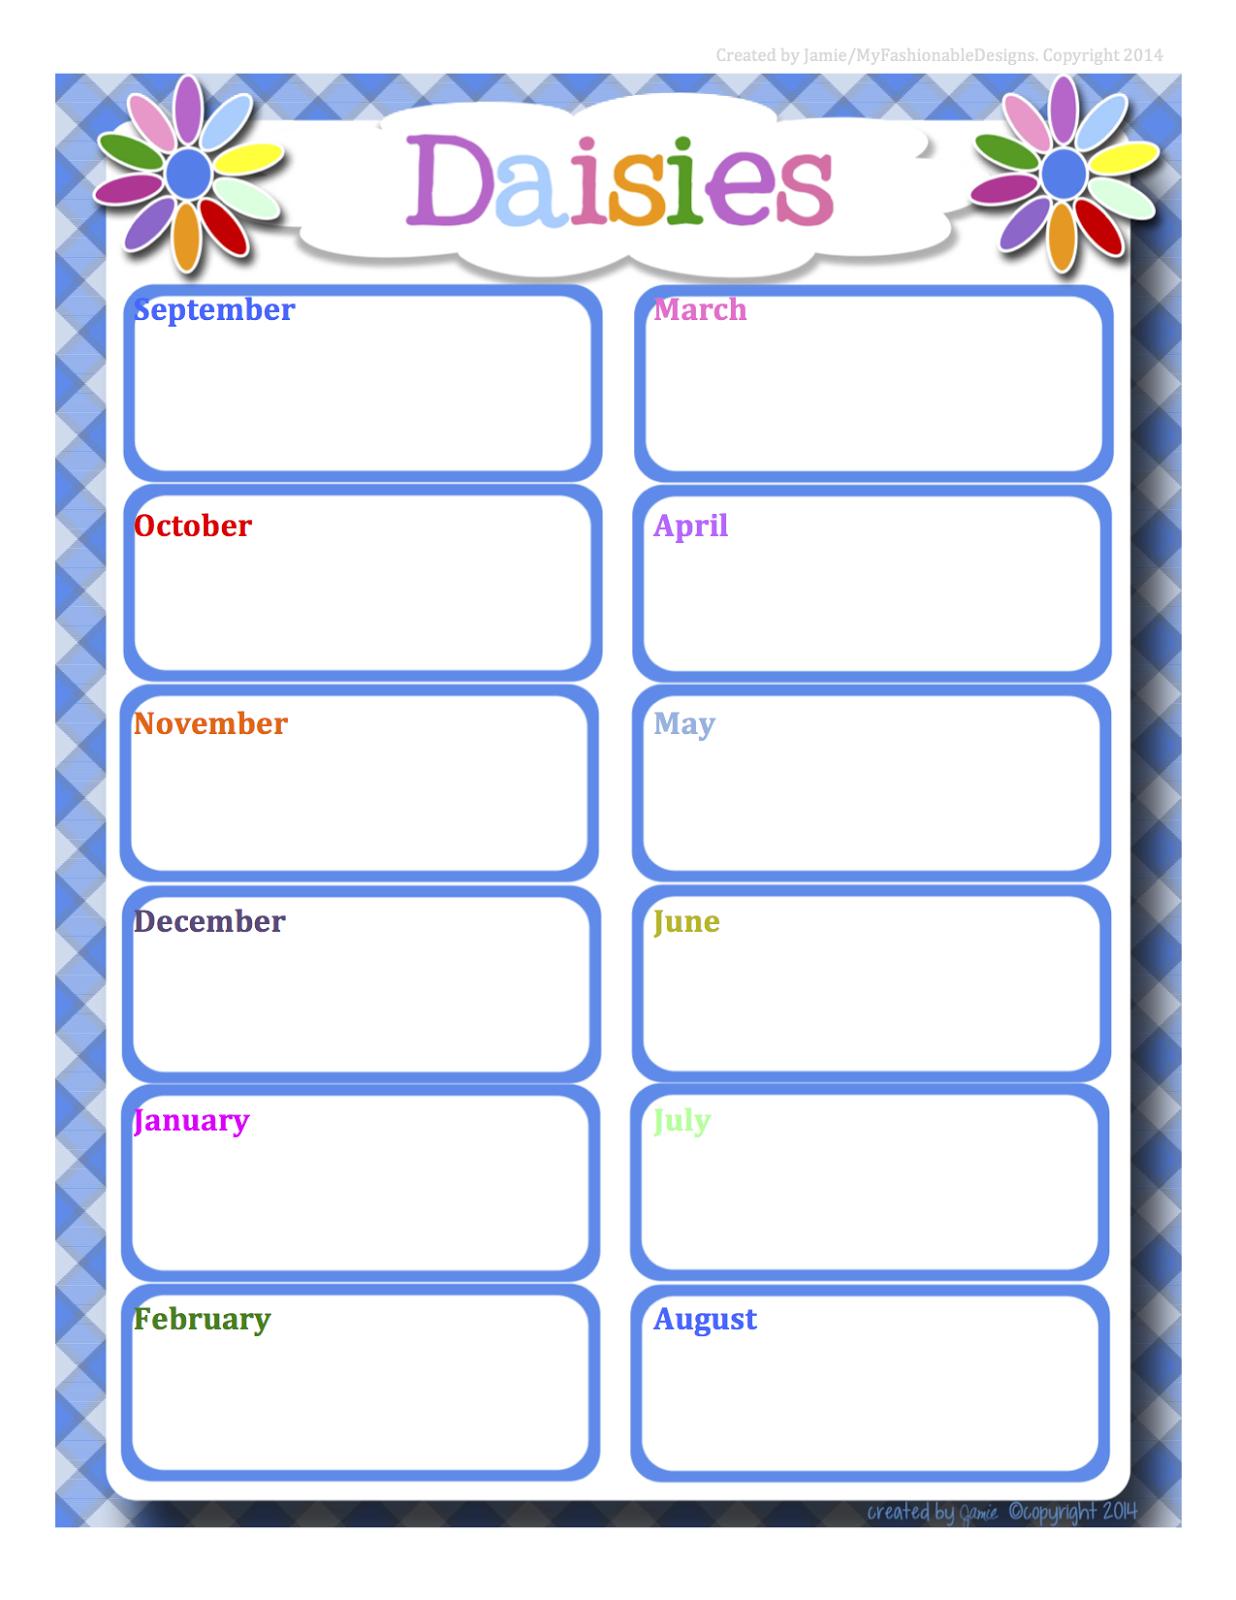 Girl Scouts Full Year Daisies Calendar